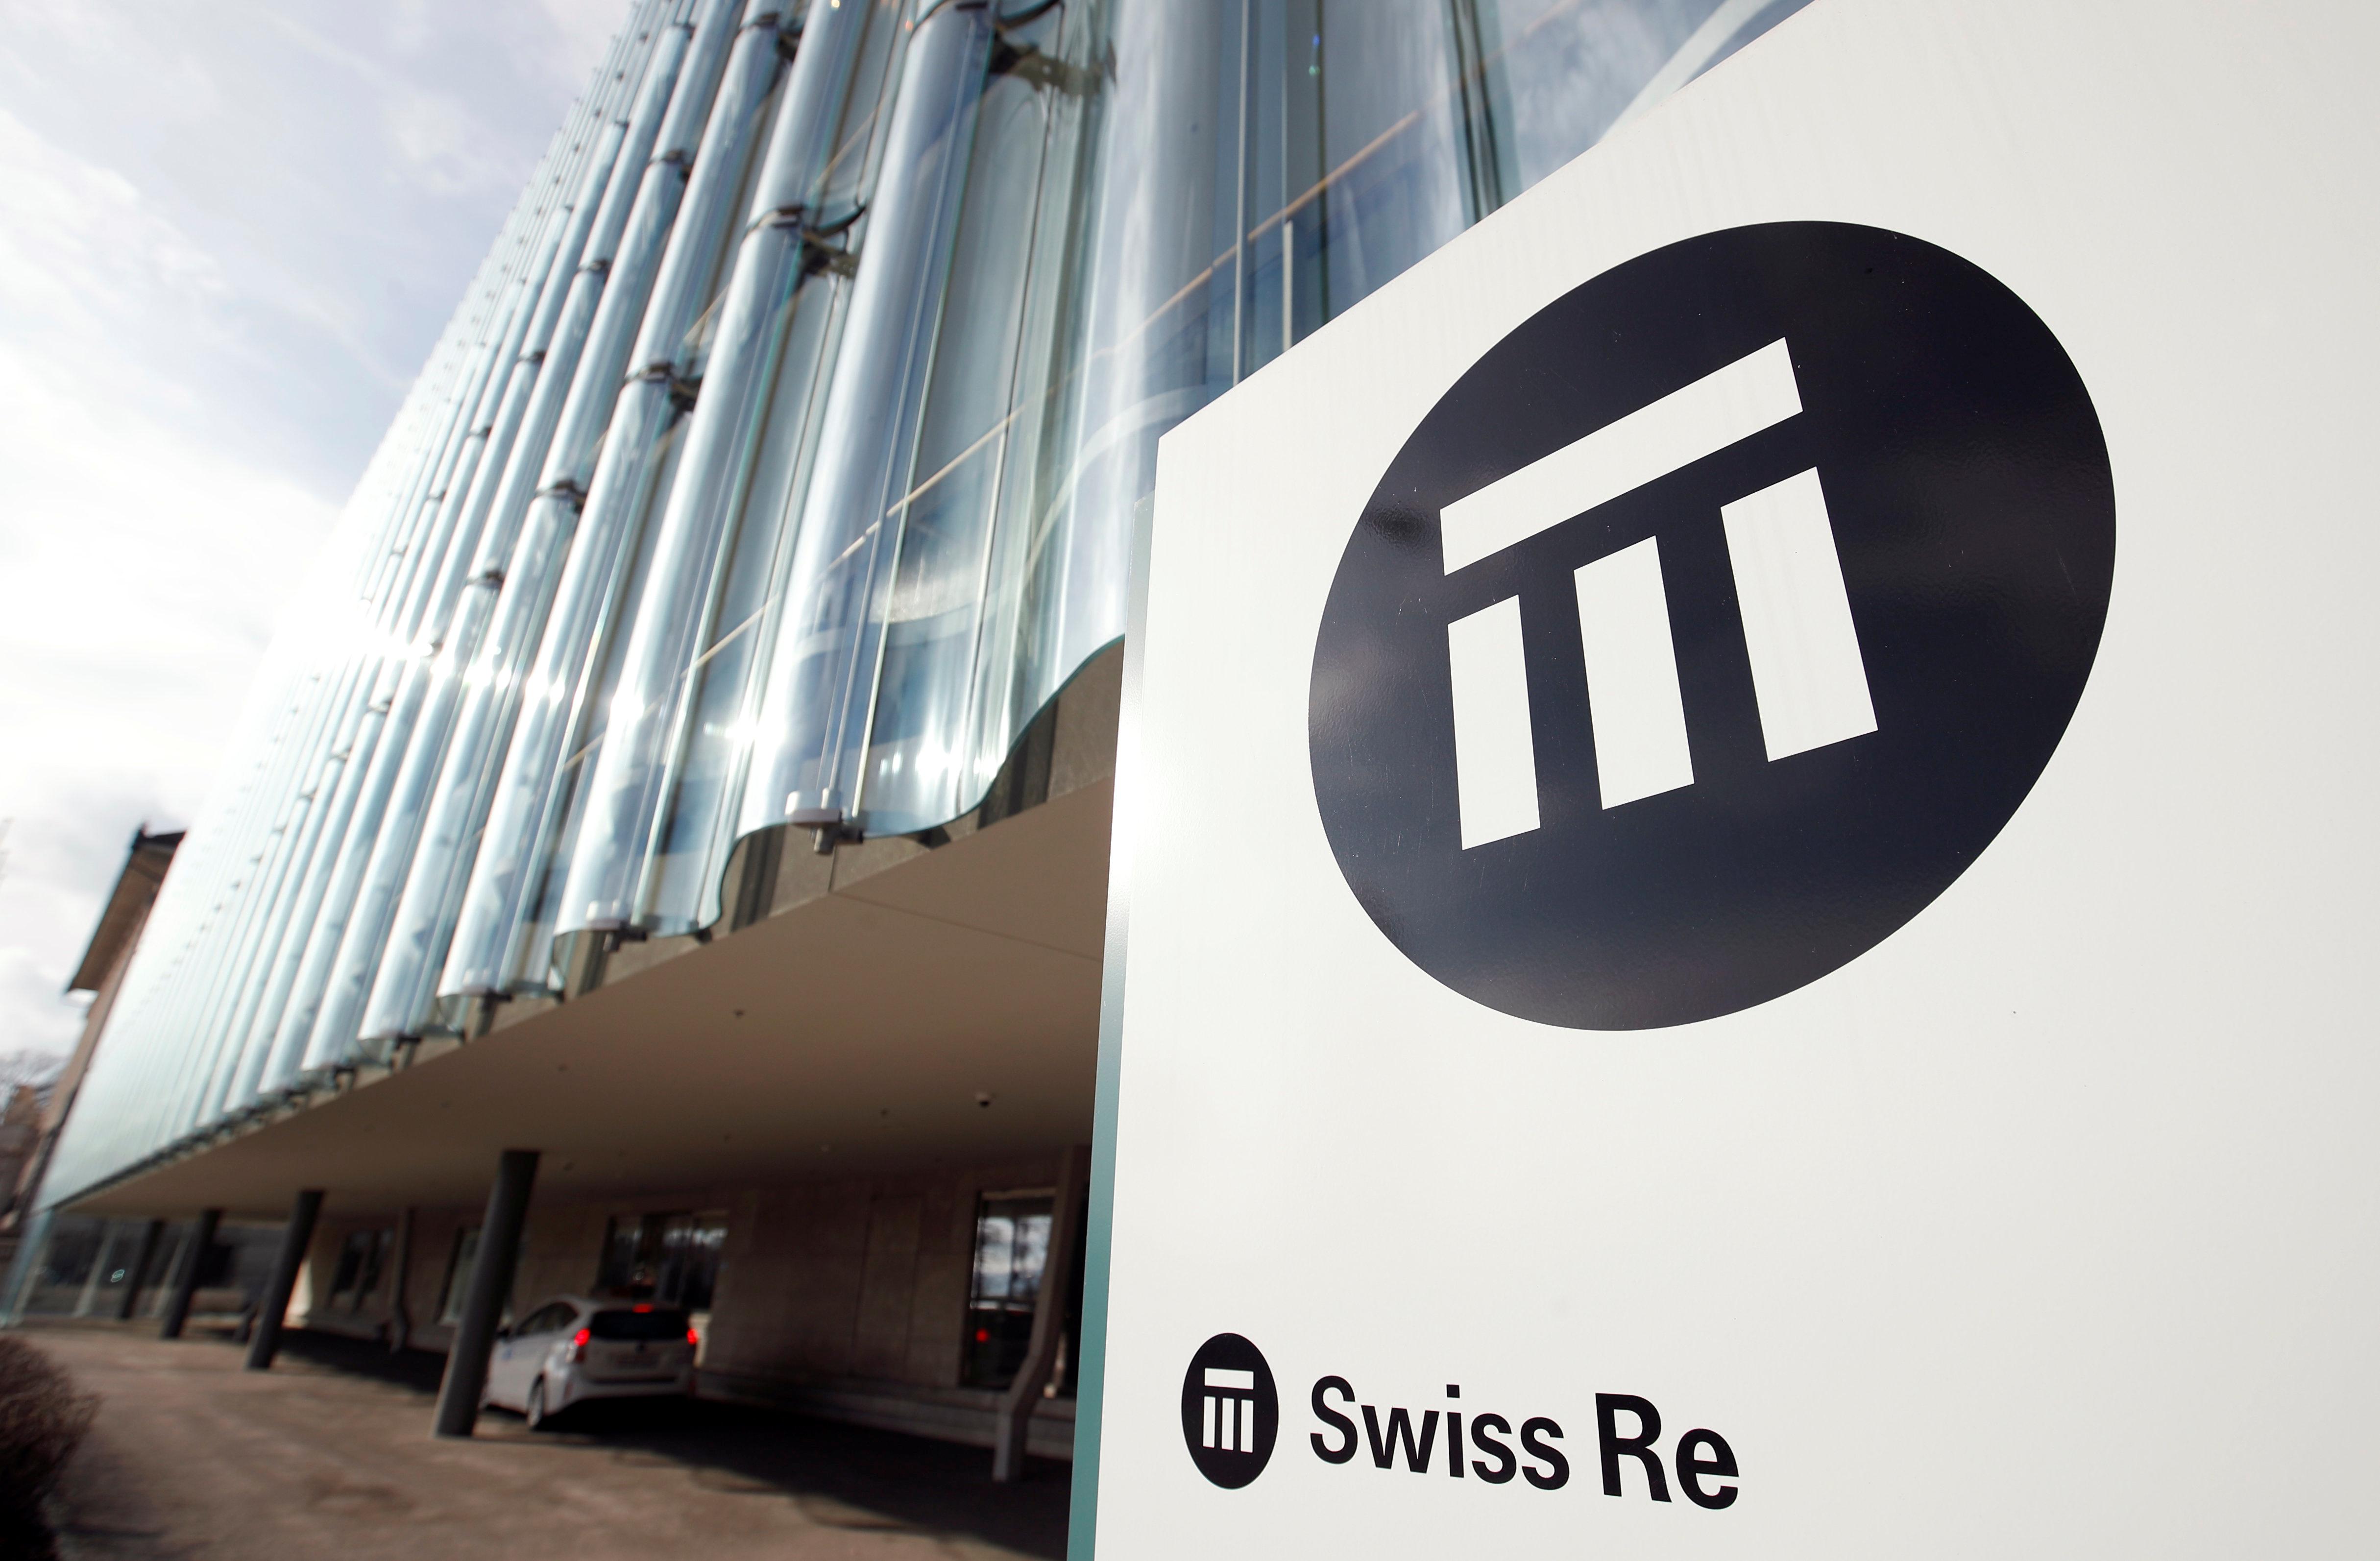 The logo of insurance company Swiss Re is seen in front of its headquarters in Zurich, Switzerland February 12, 2019.  REUTERS/Arnd WIegmann